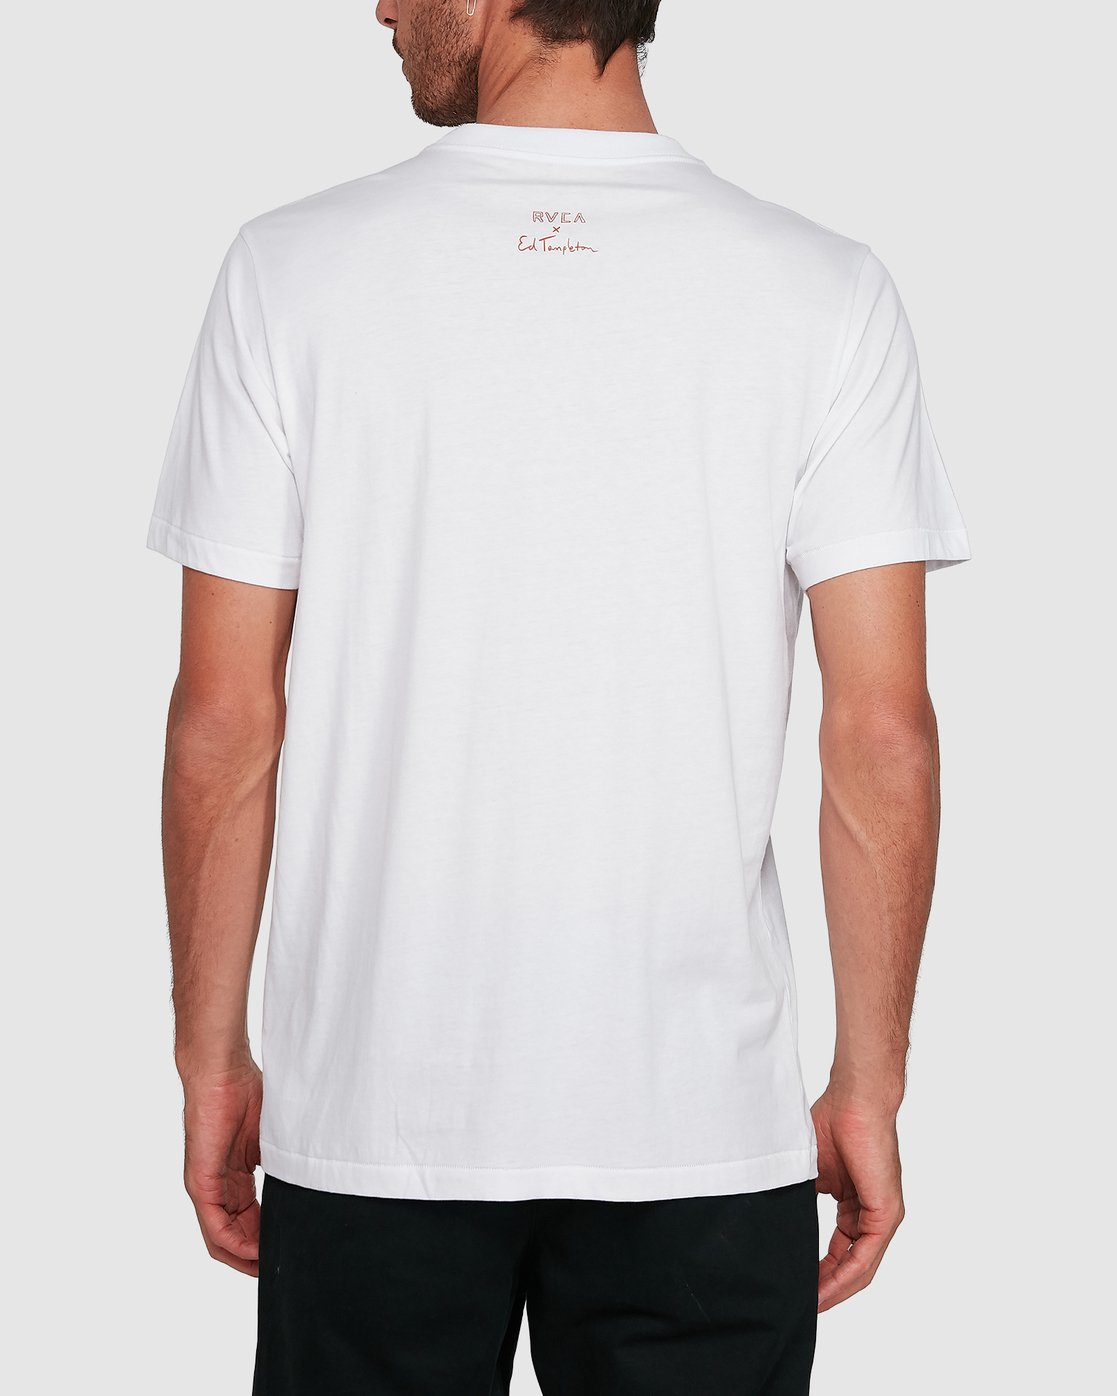 2 Ed Speak Short Sleeve Tee White R108041 RVCA